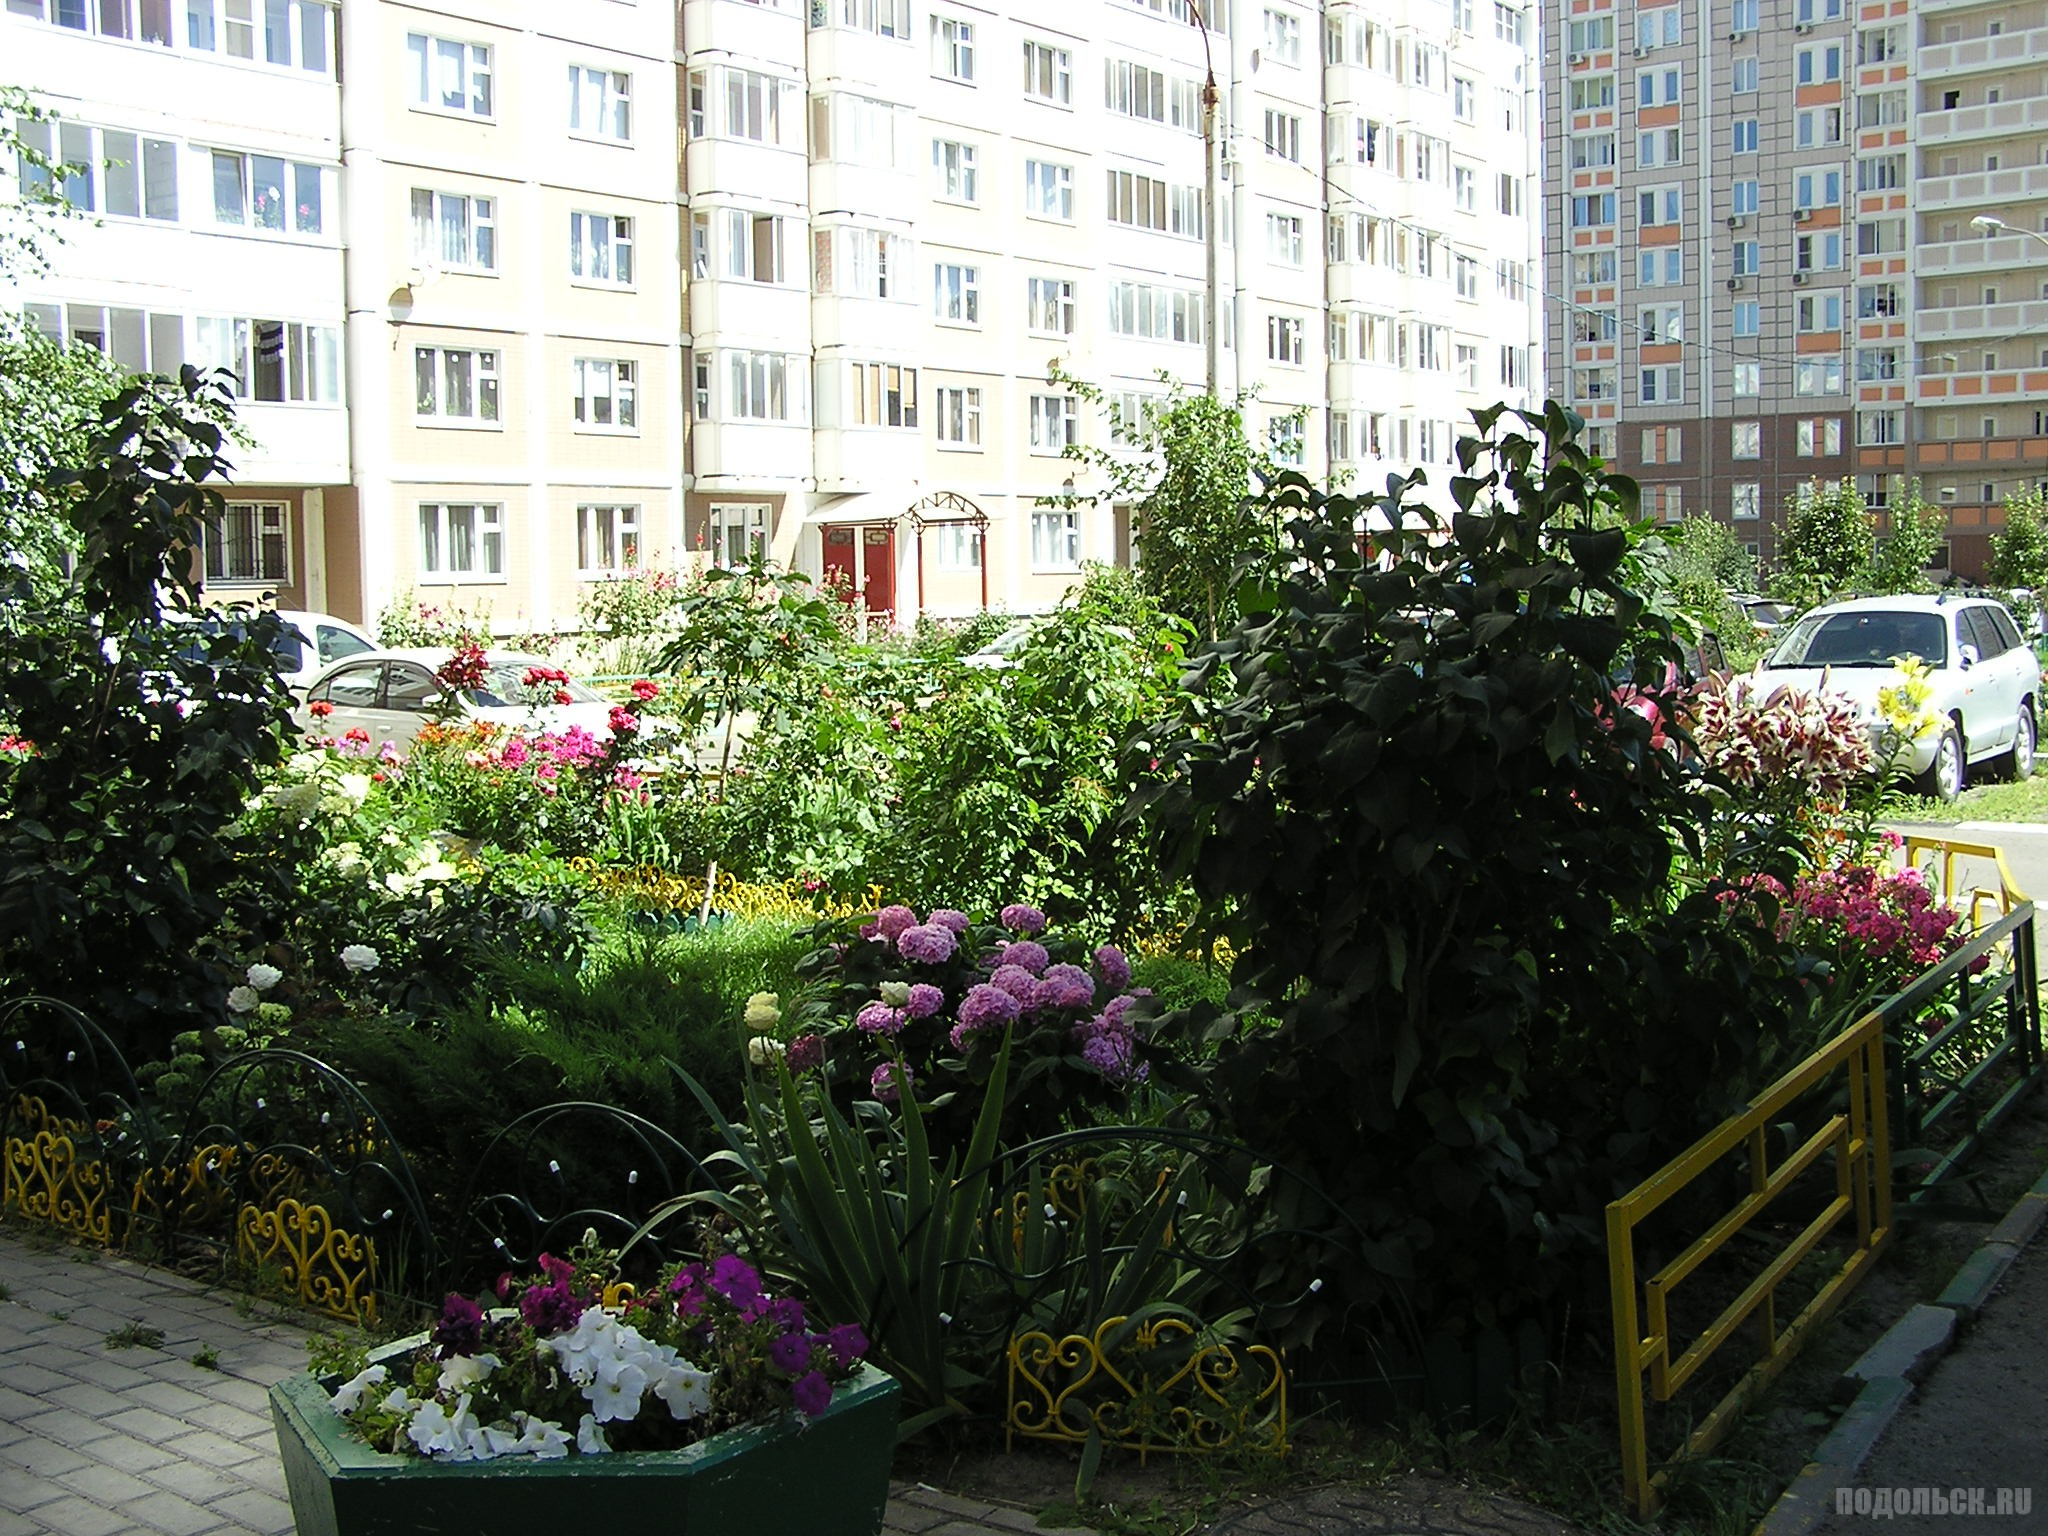 Улица Академика Доллежаля.6 августа 2017 г.